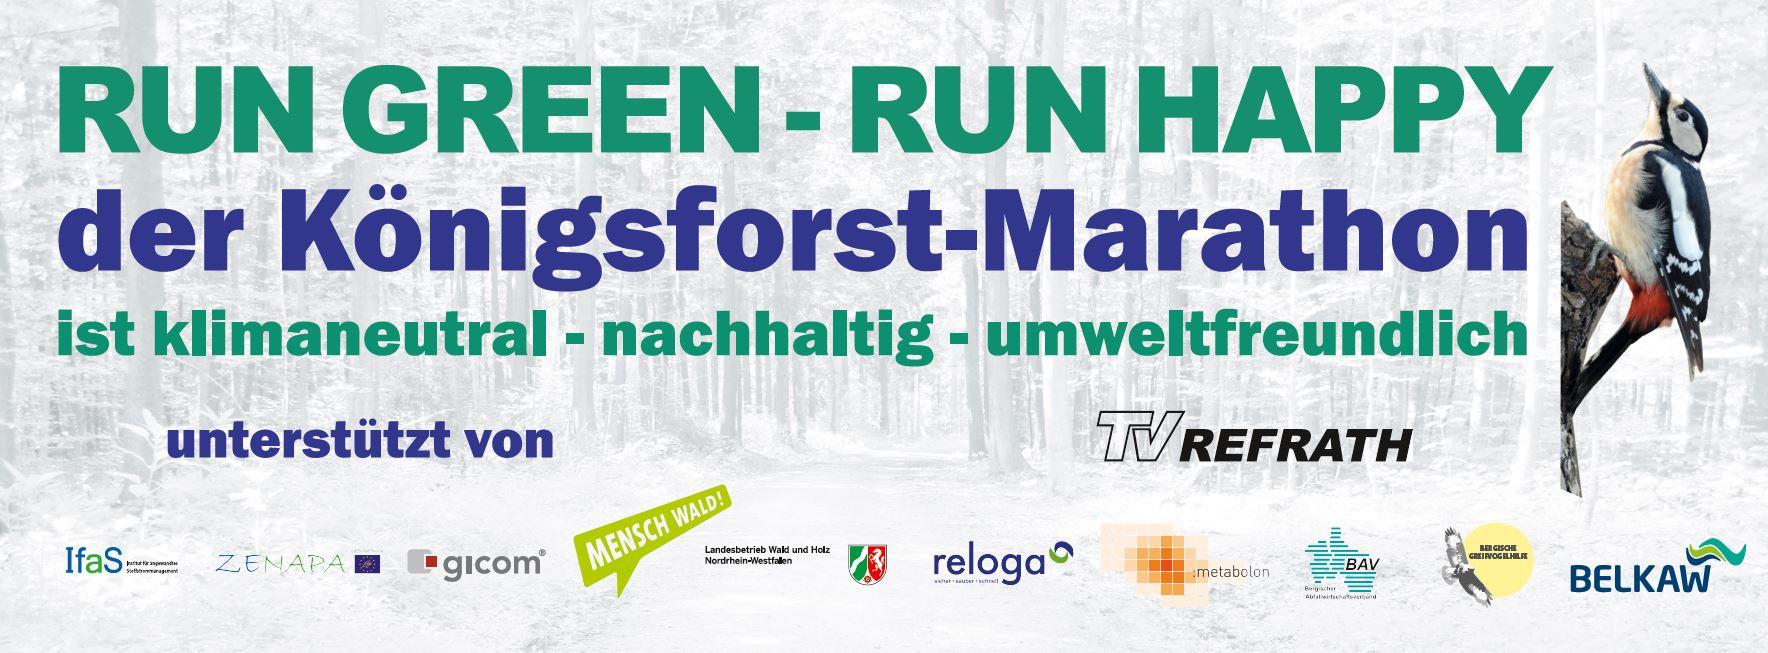 RUN GREEN - RUN HAPPY - Köfo-M klimaneutral Webbanner 2019-2020